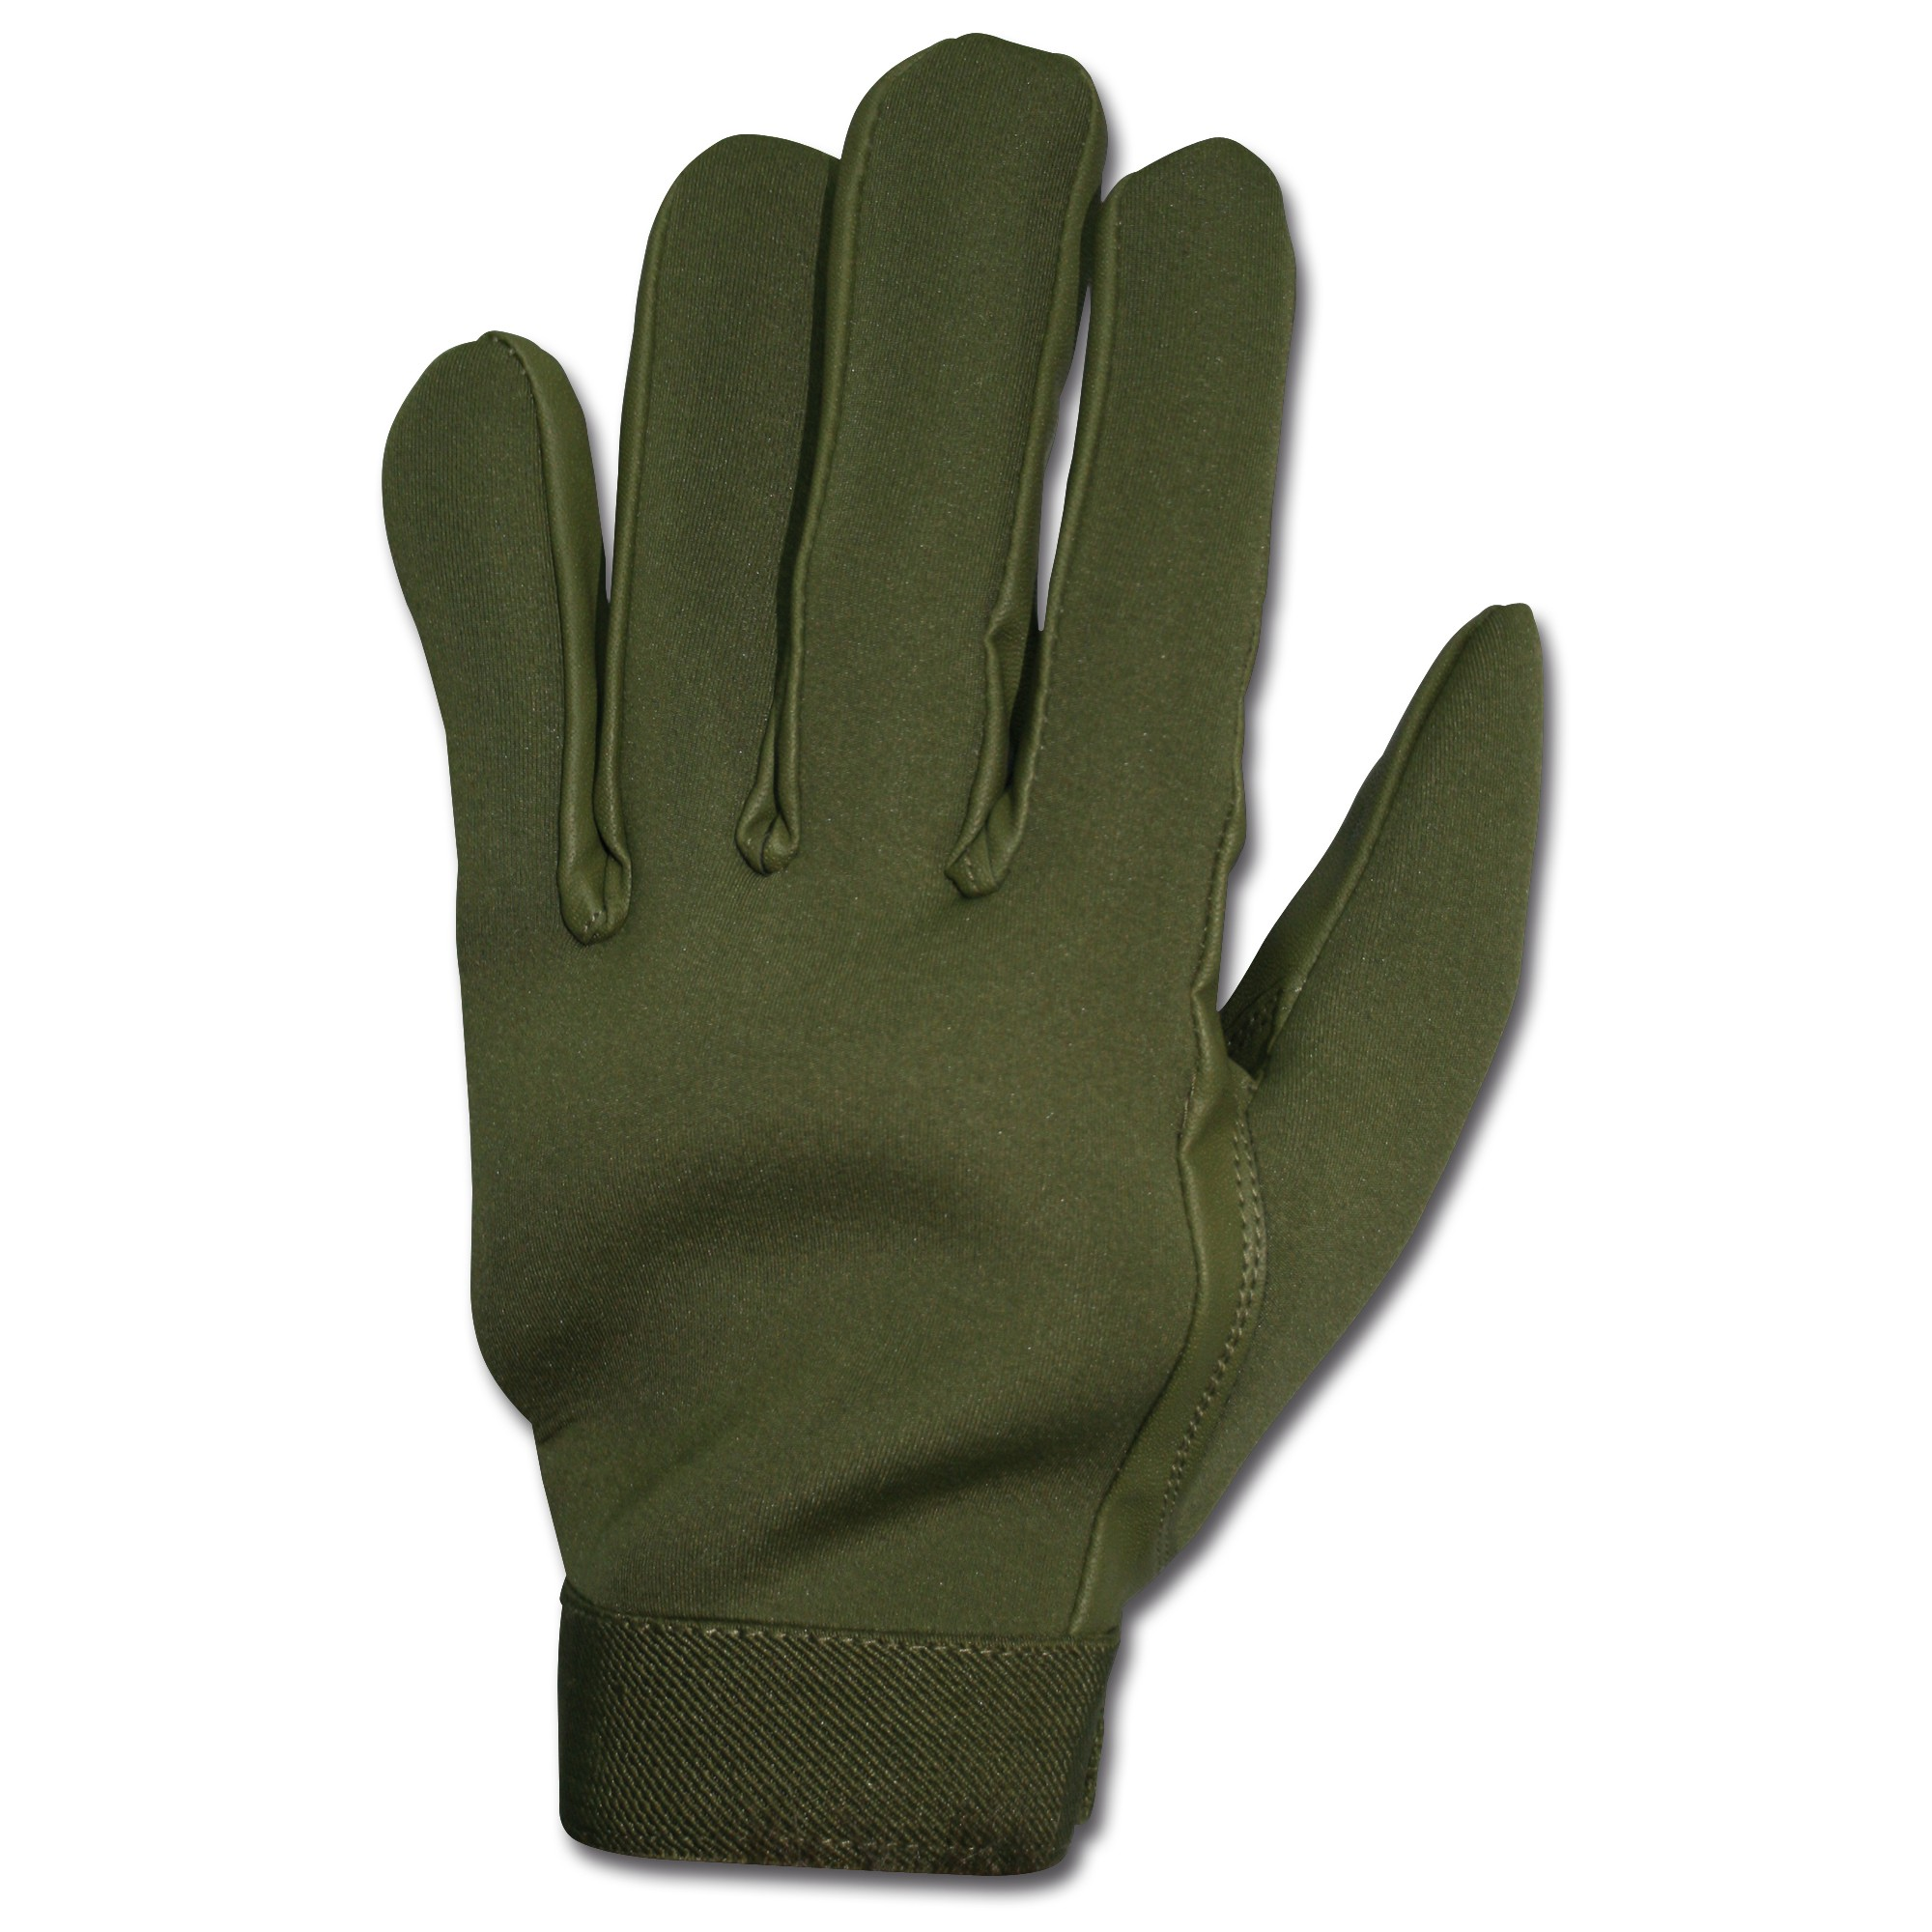 Neopren Fingerhandschuhe Profi oliv